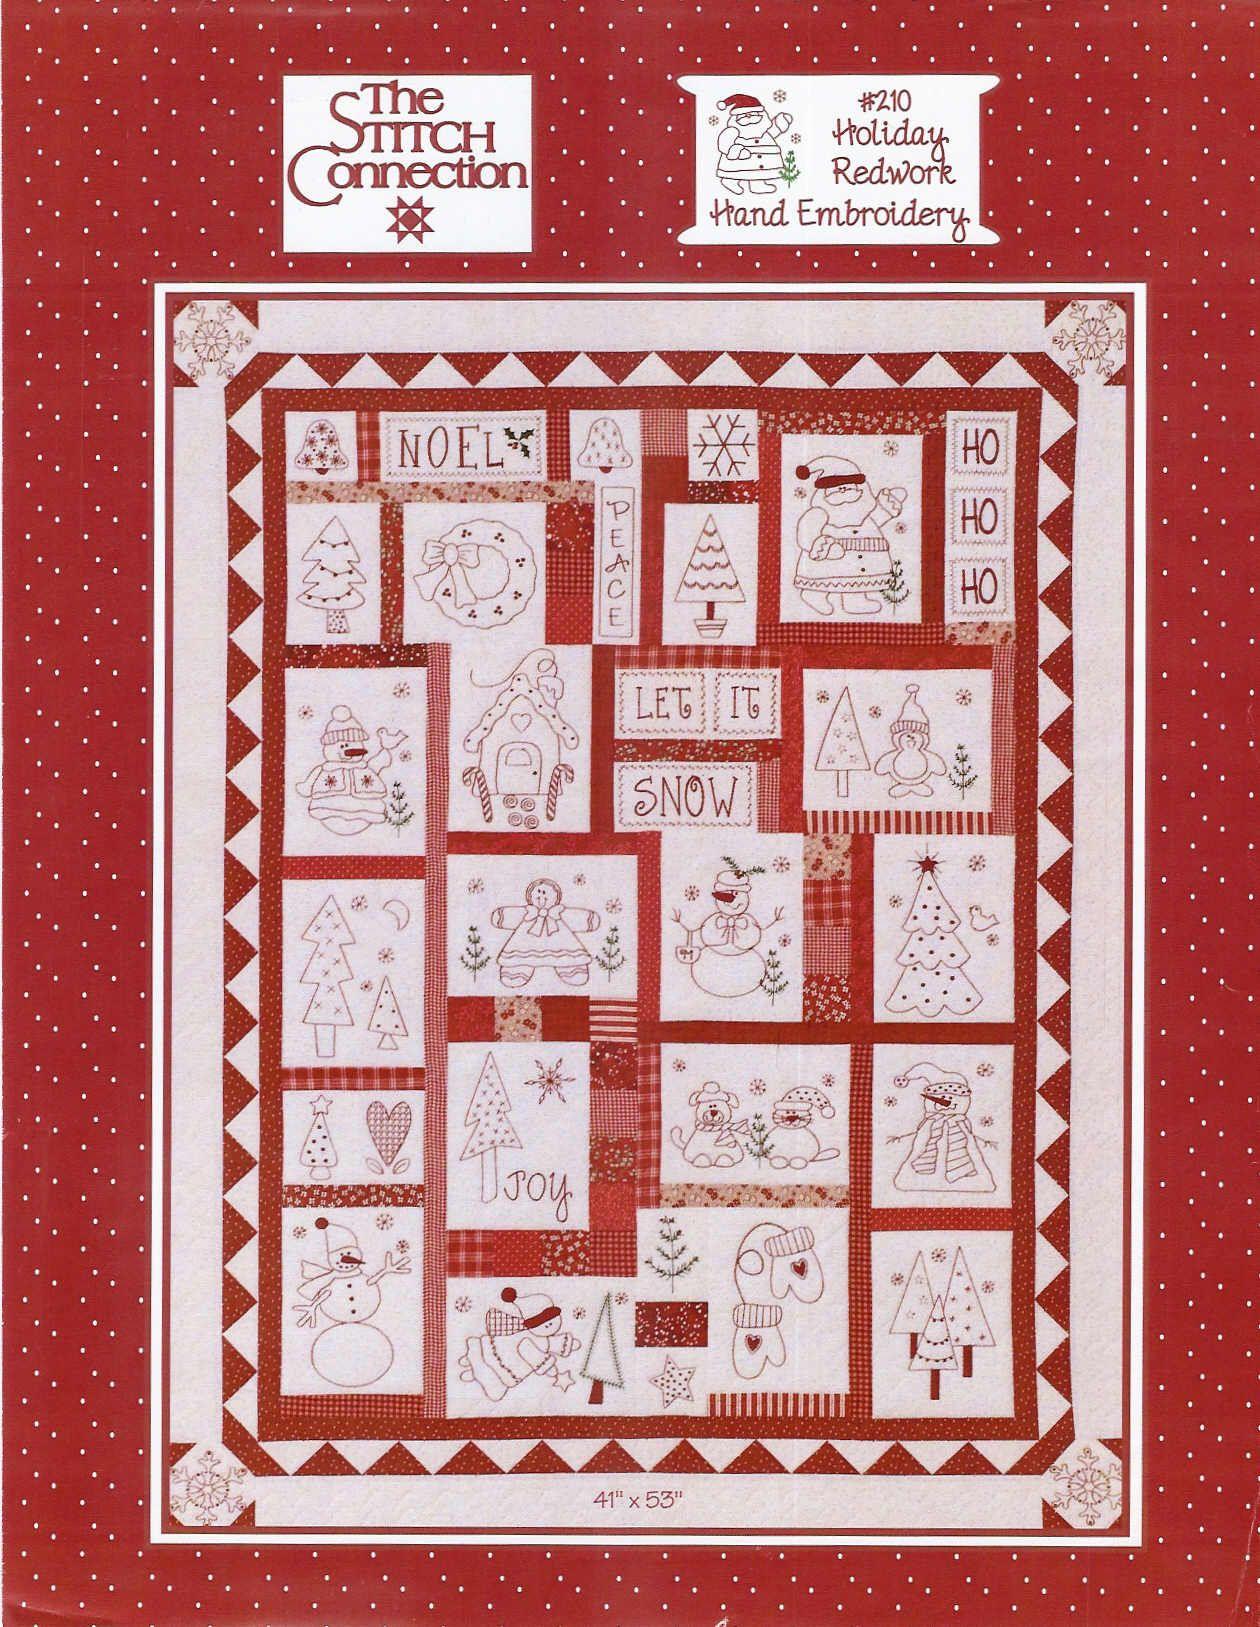 Free Redwork Quilt Patterns   EMBROIDERY REDWORK PATTERNS   Browse ... : embroidered quilts patterns - Adamdwight.com